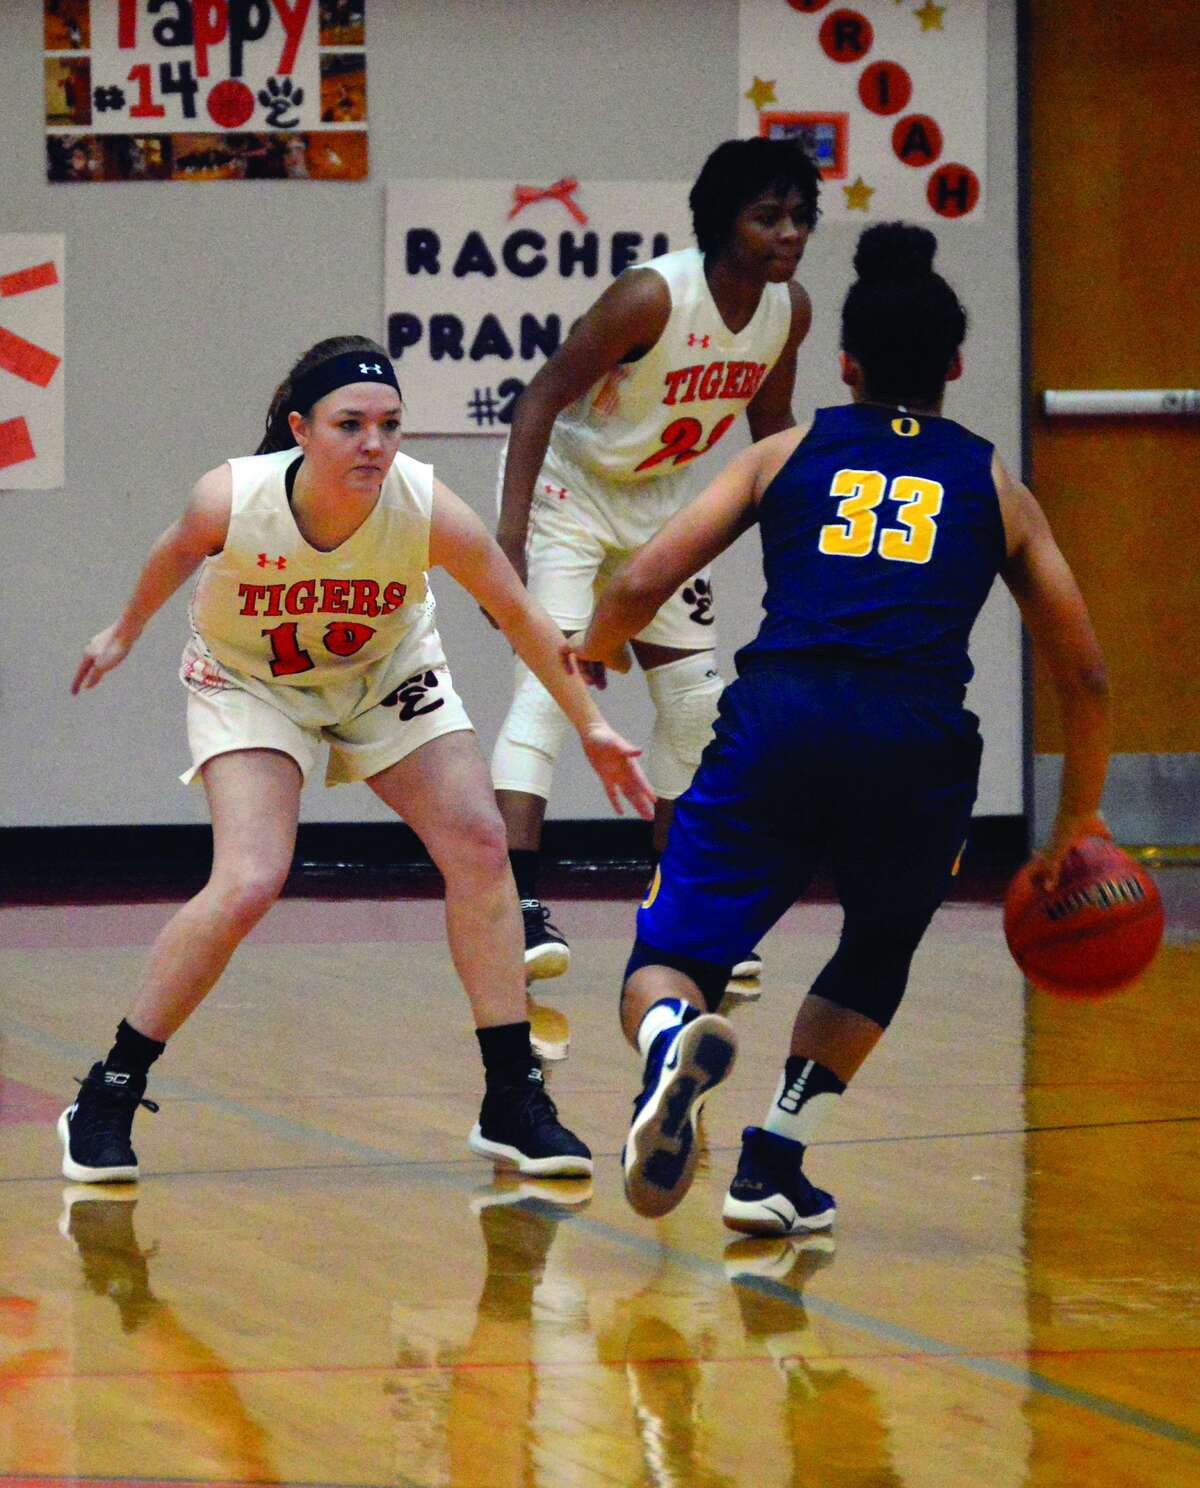 Edwardsville senior guard Rachel Vinyard plays defense in the first quarter.